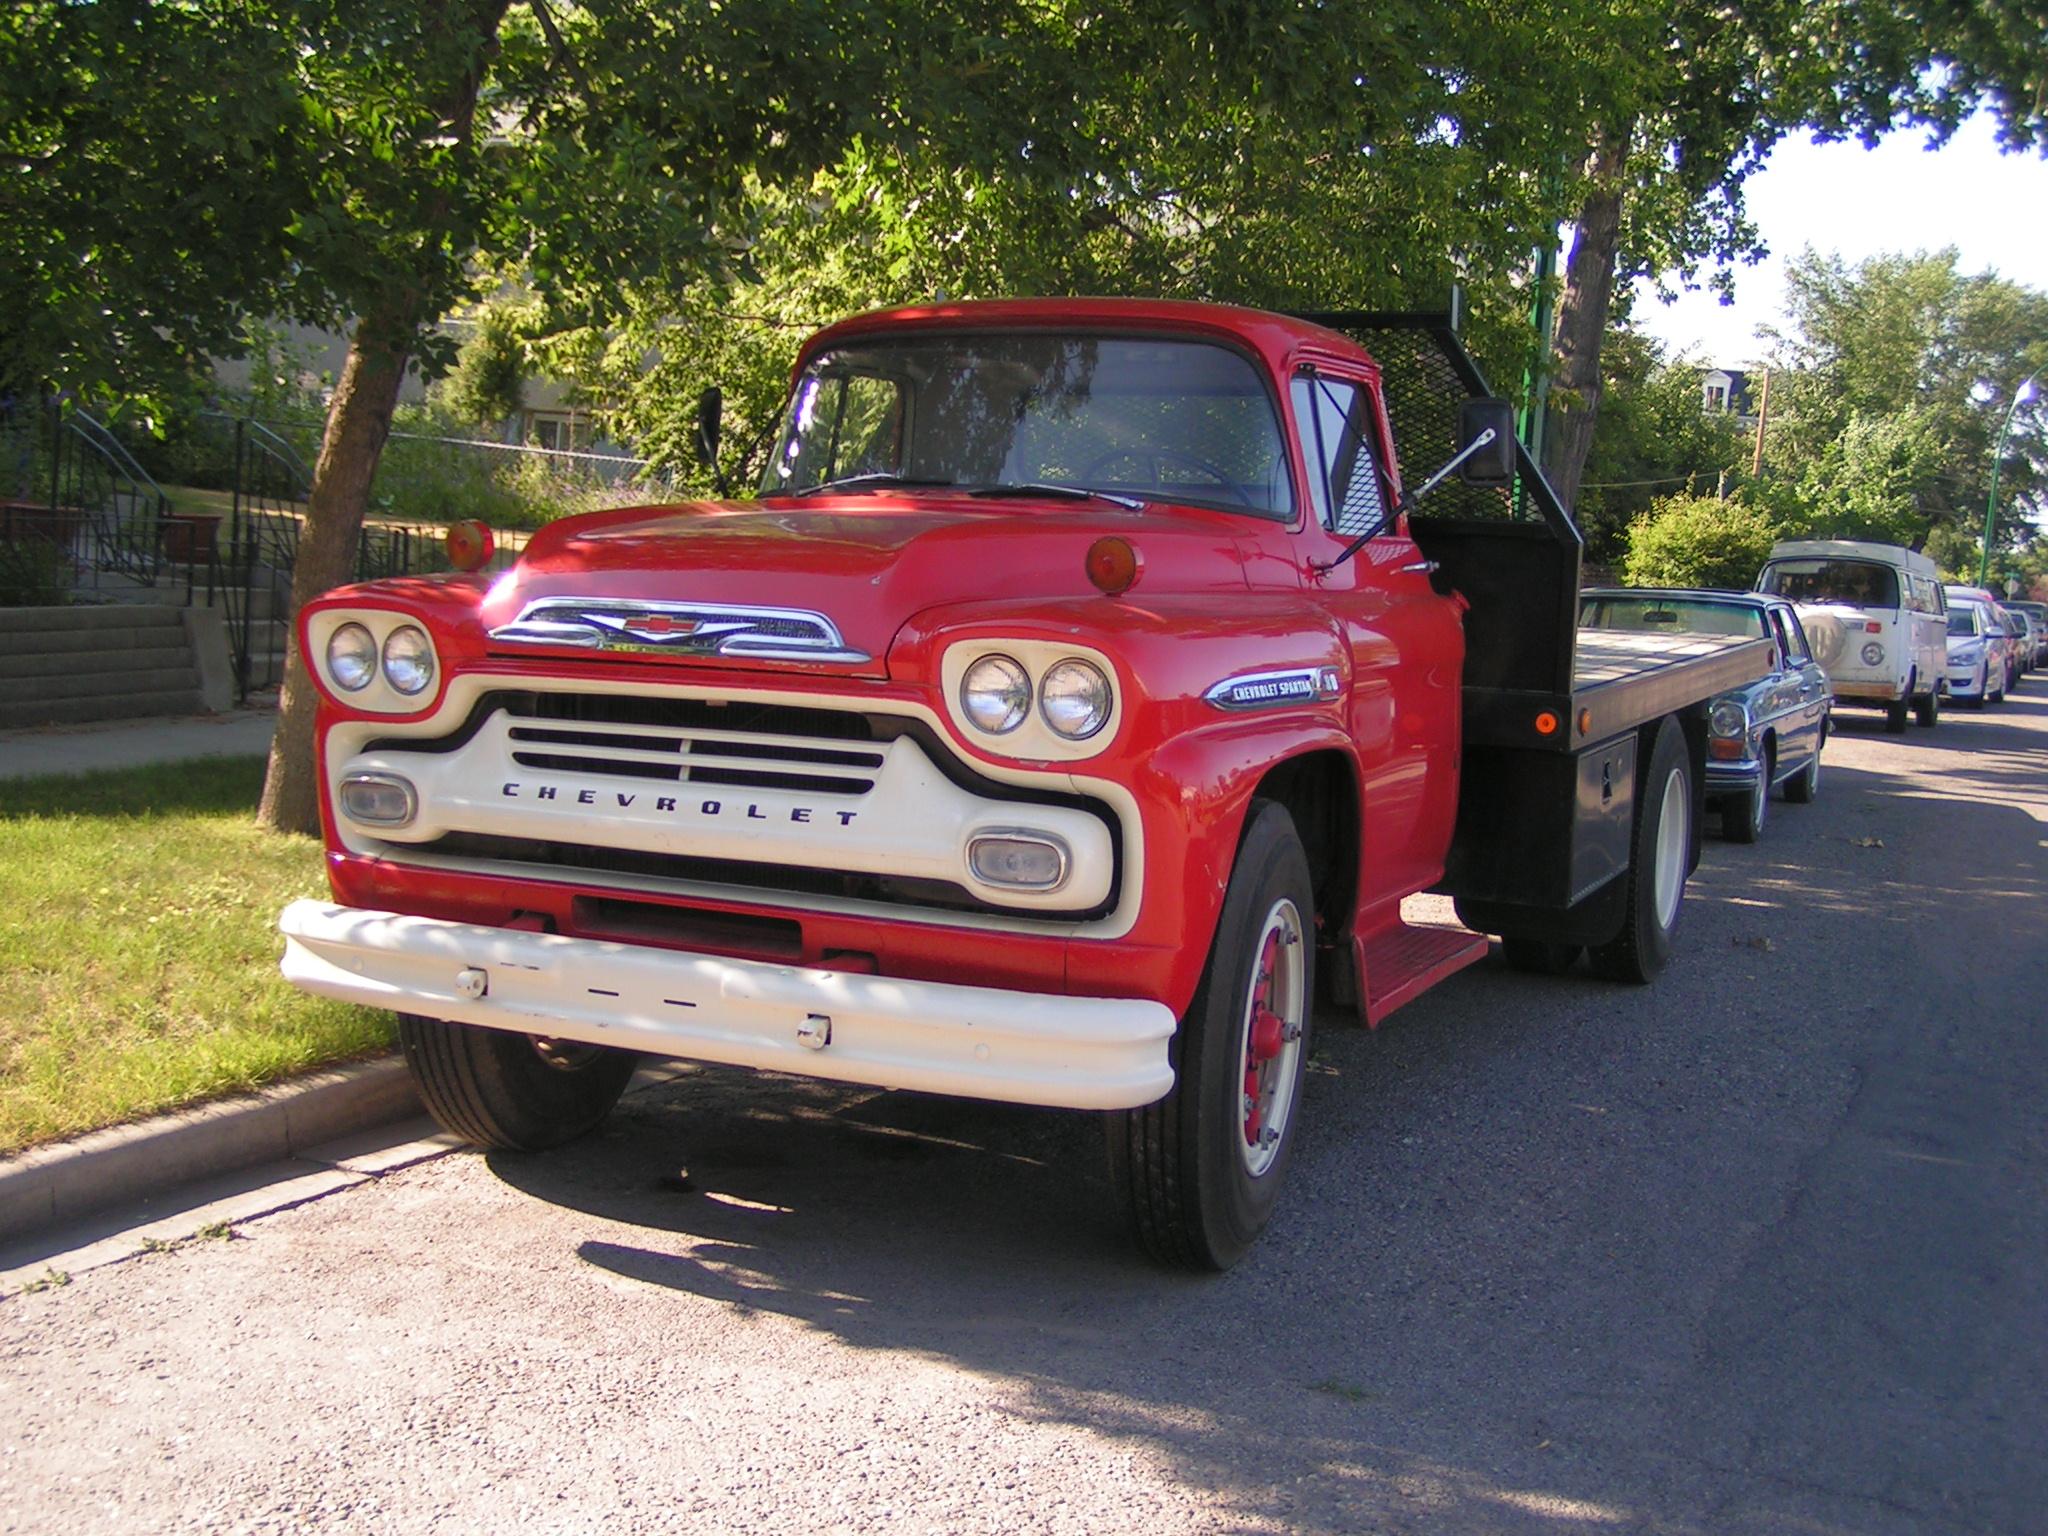 File:1959 Chevrolet Spartan Truck (854998345) jpg